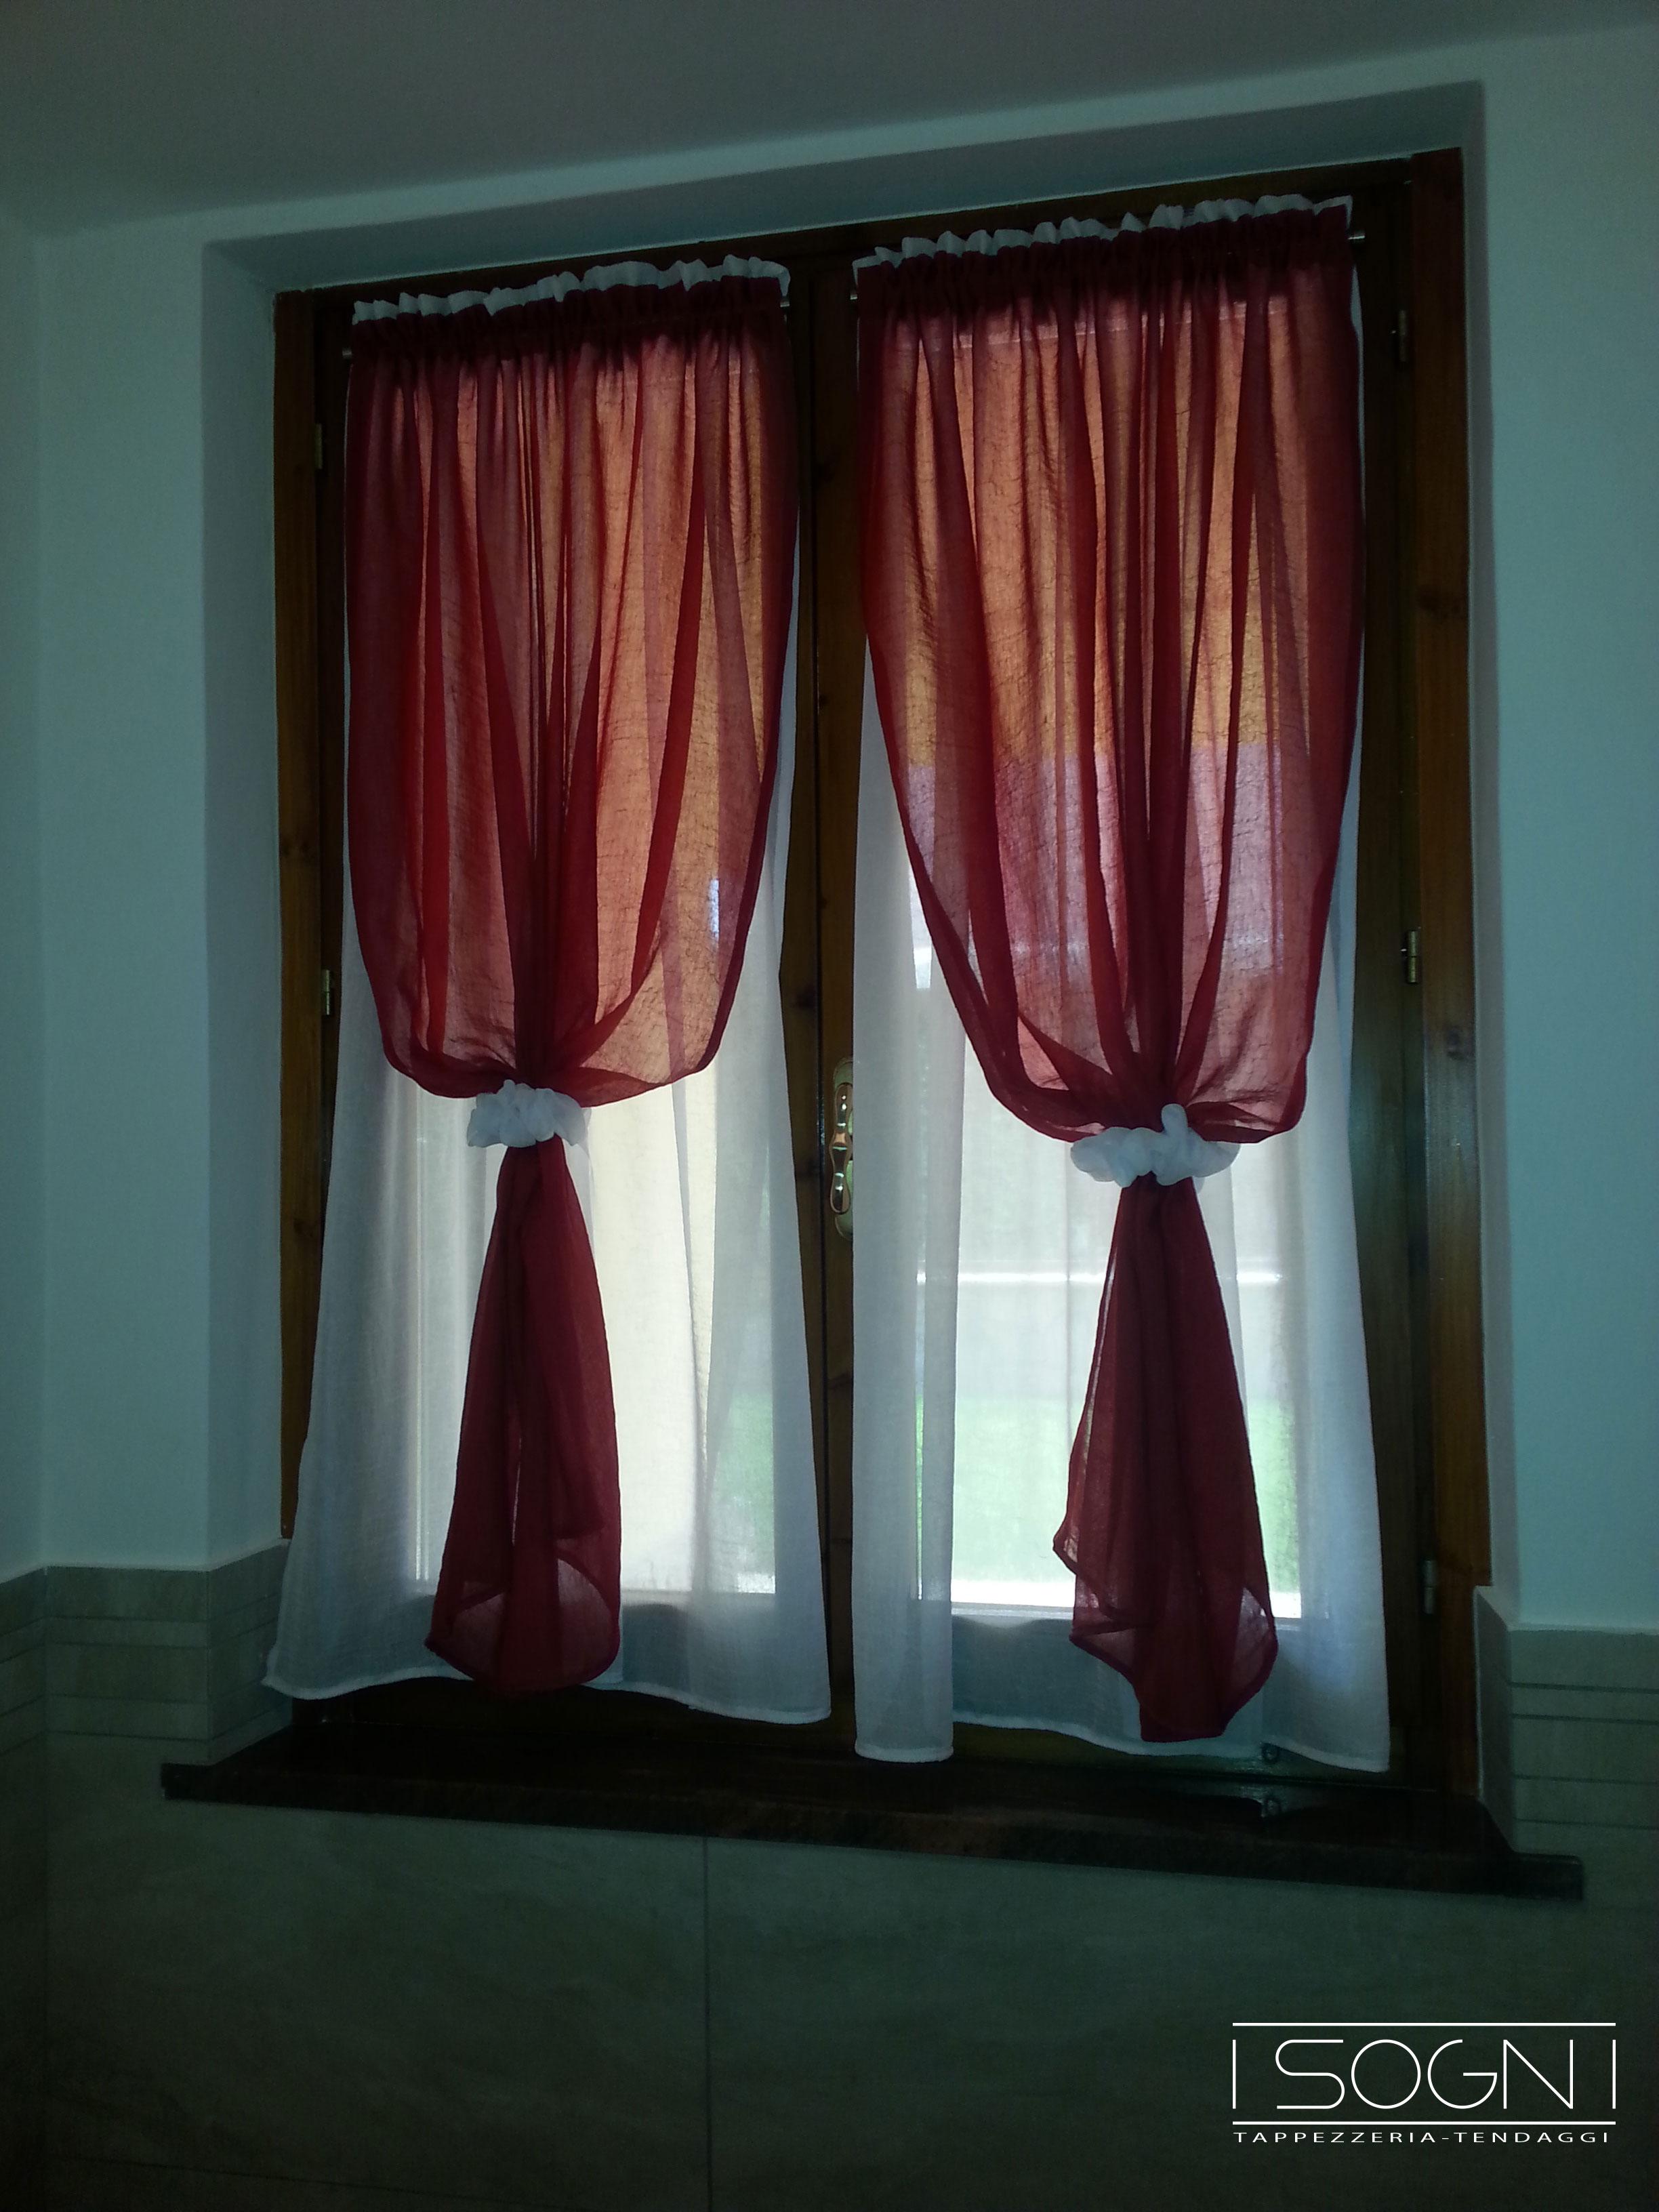 13 tende verona tendaggi verona tende per la casa verona tende a vetro verona tende design - Tende classiche per bagno ...